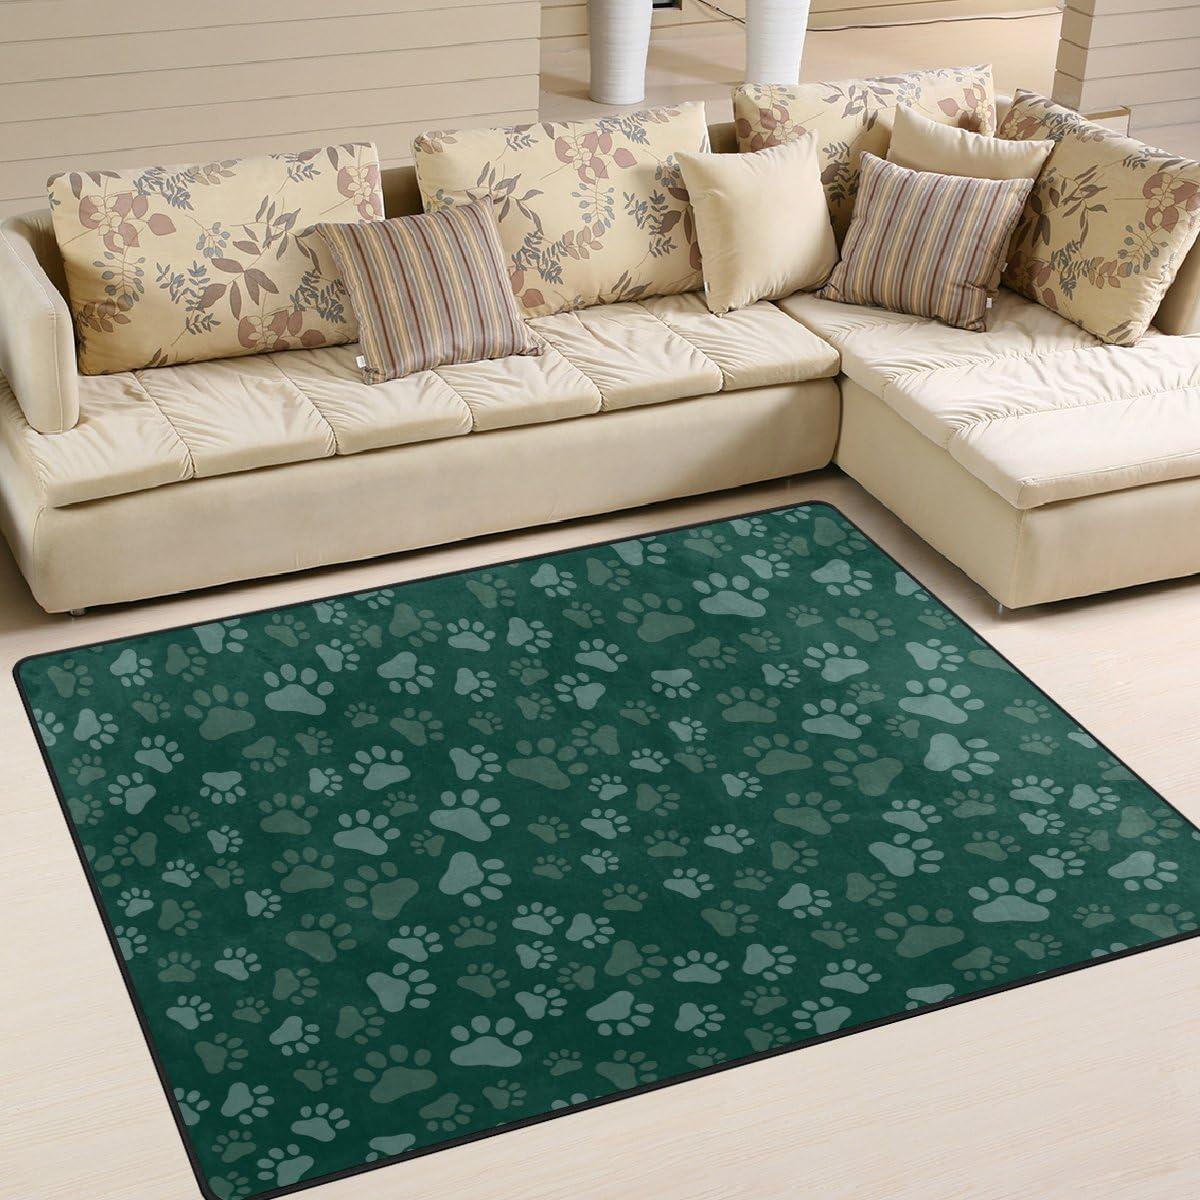 SAVSV Dog Paw Print Printed Large Area Rugs,Lightweight Floor Carpet Use